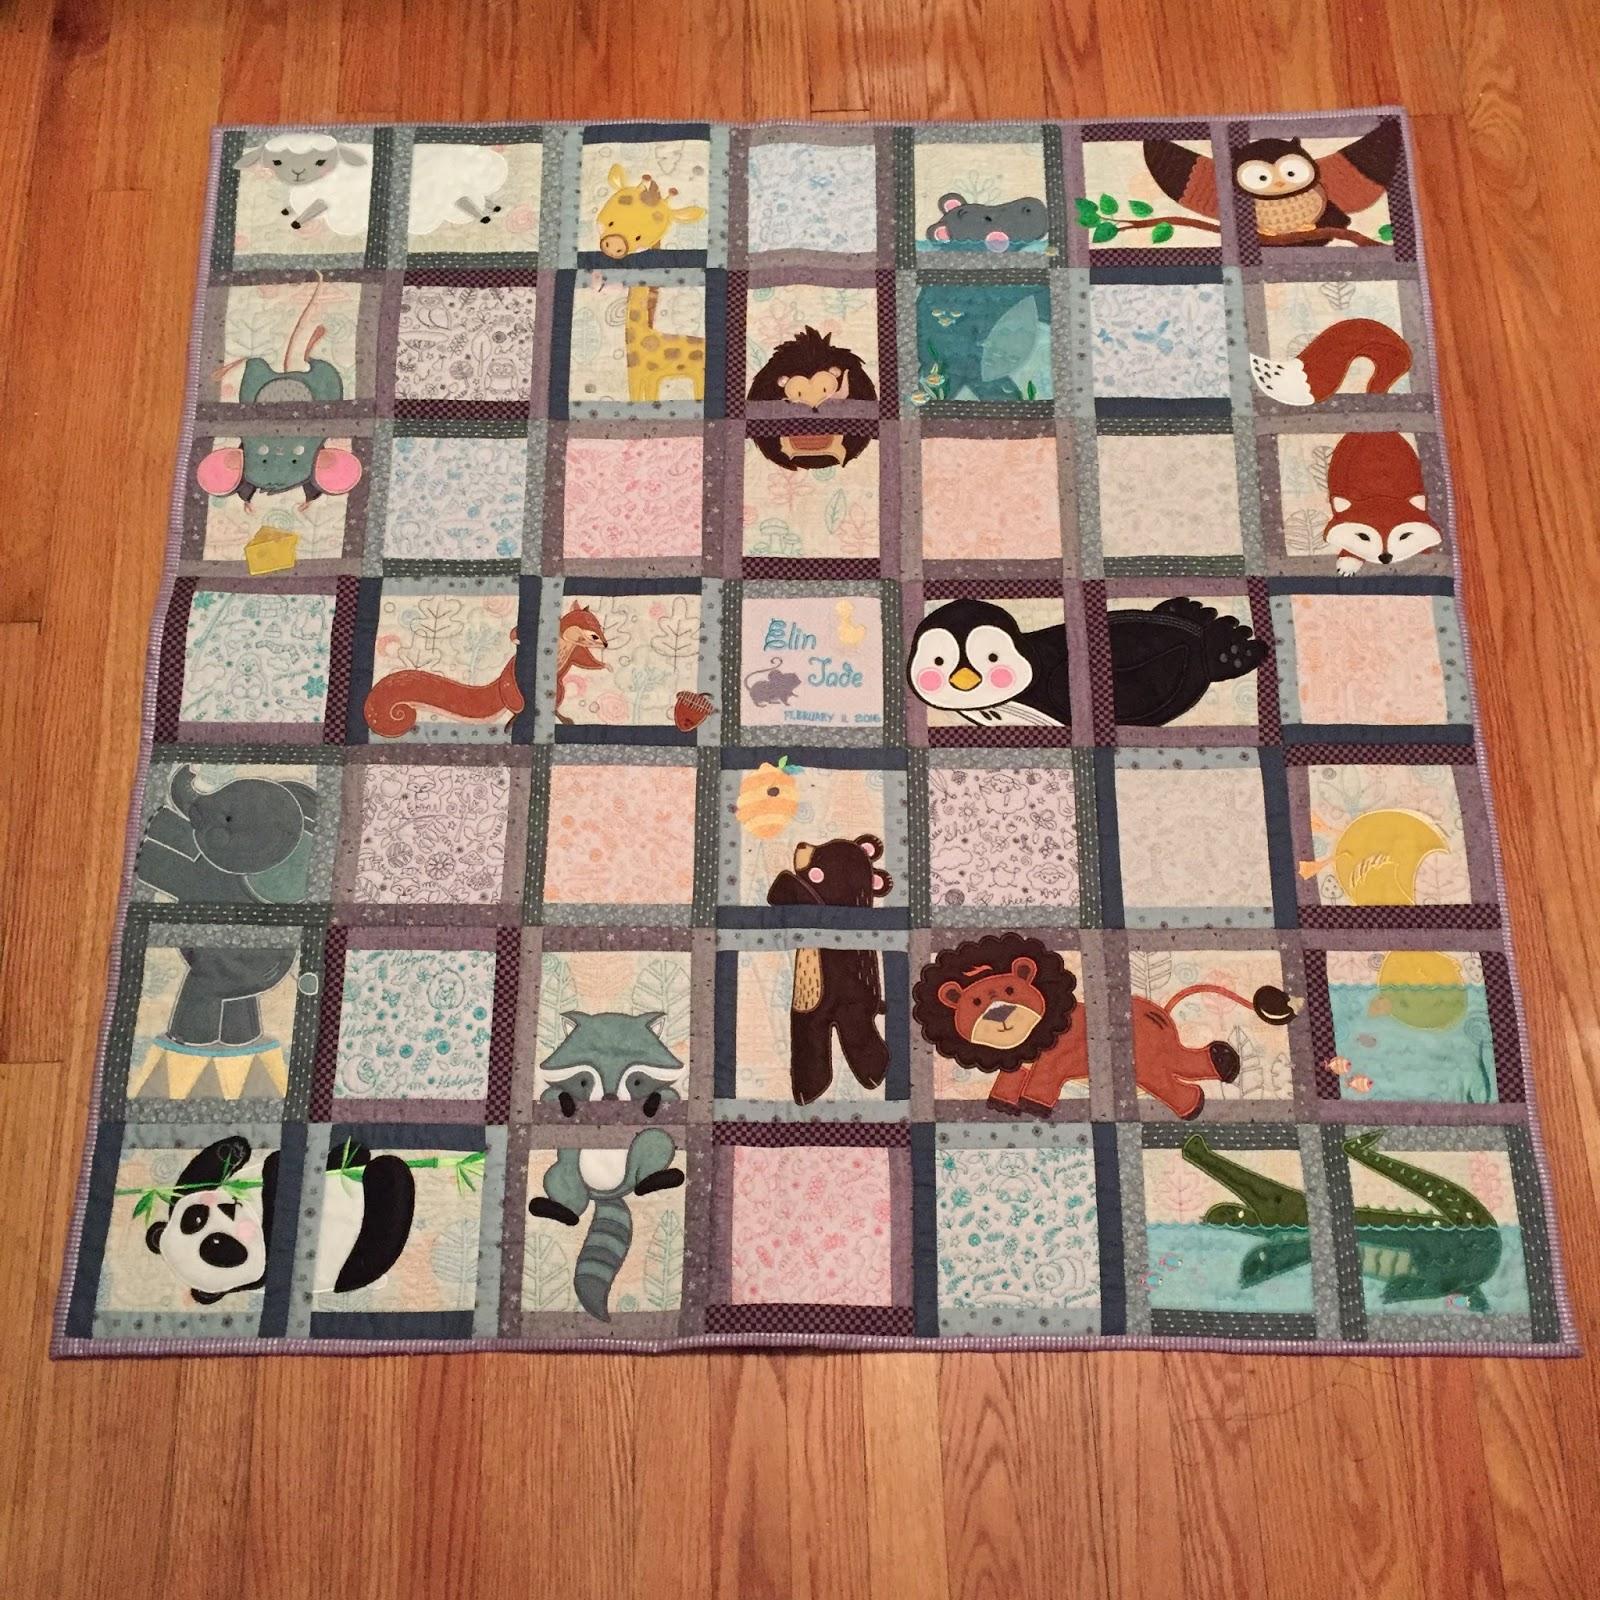 Sew Many Quilts Amp More Anita Goodesign S Animal Adventures